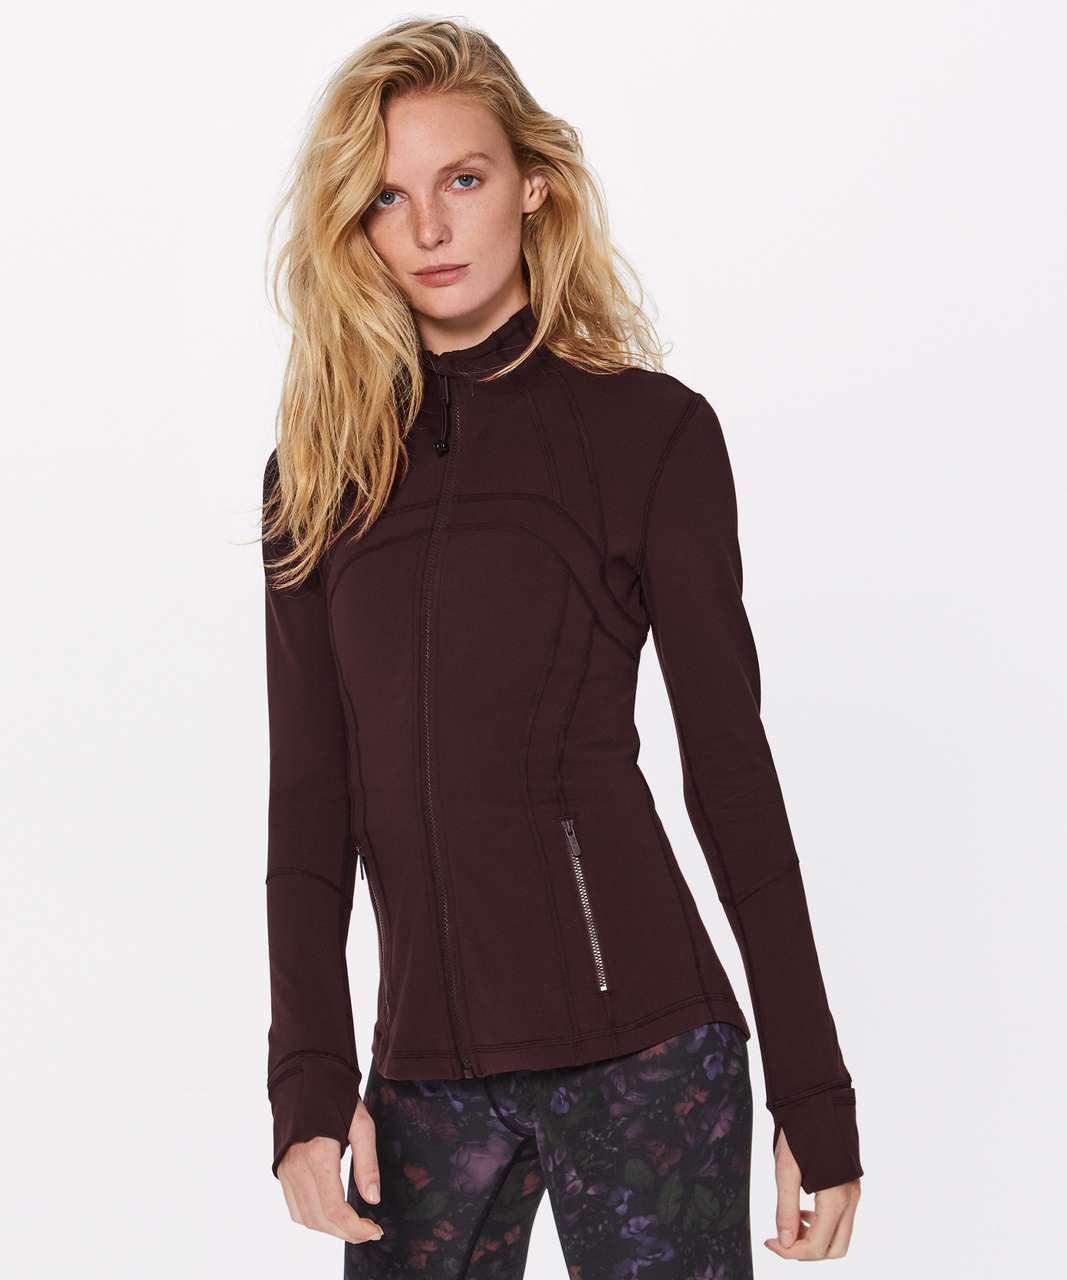 Lululemon Define Jacket - Garnet